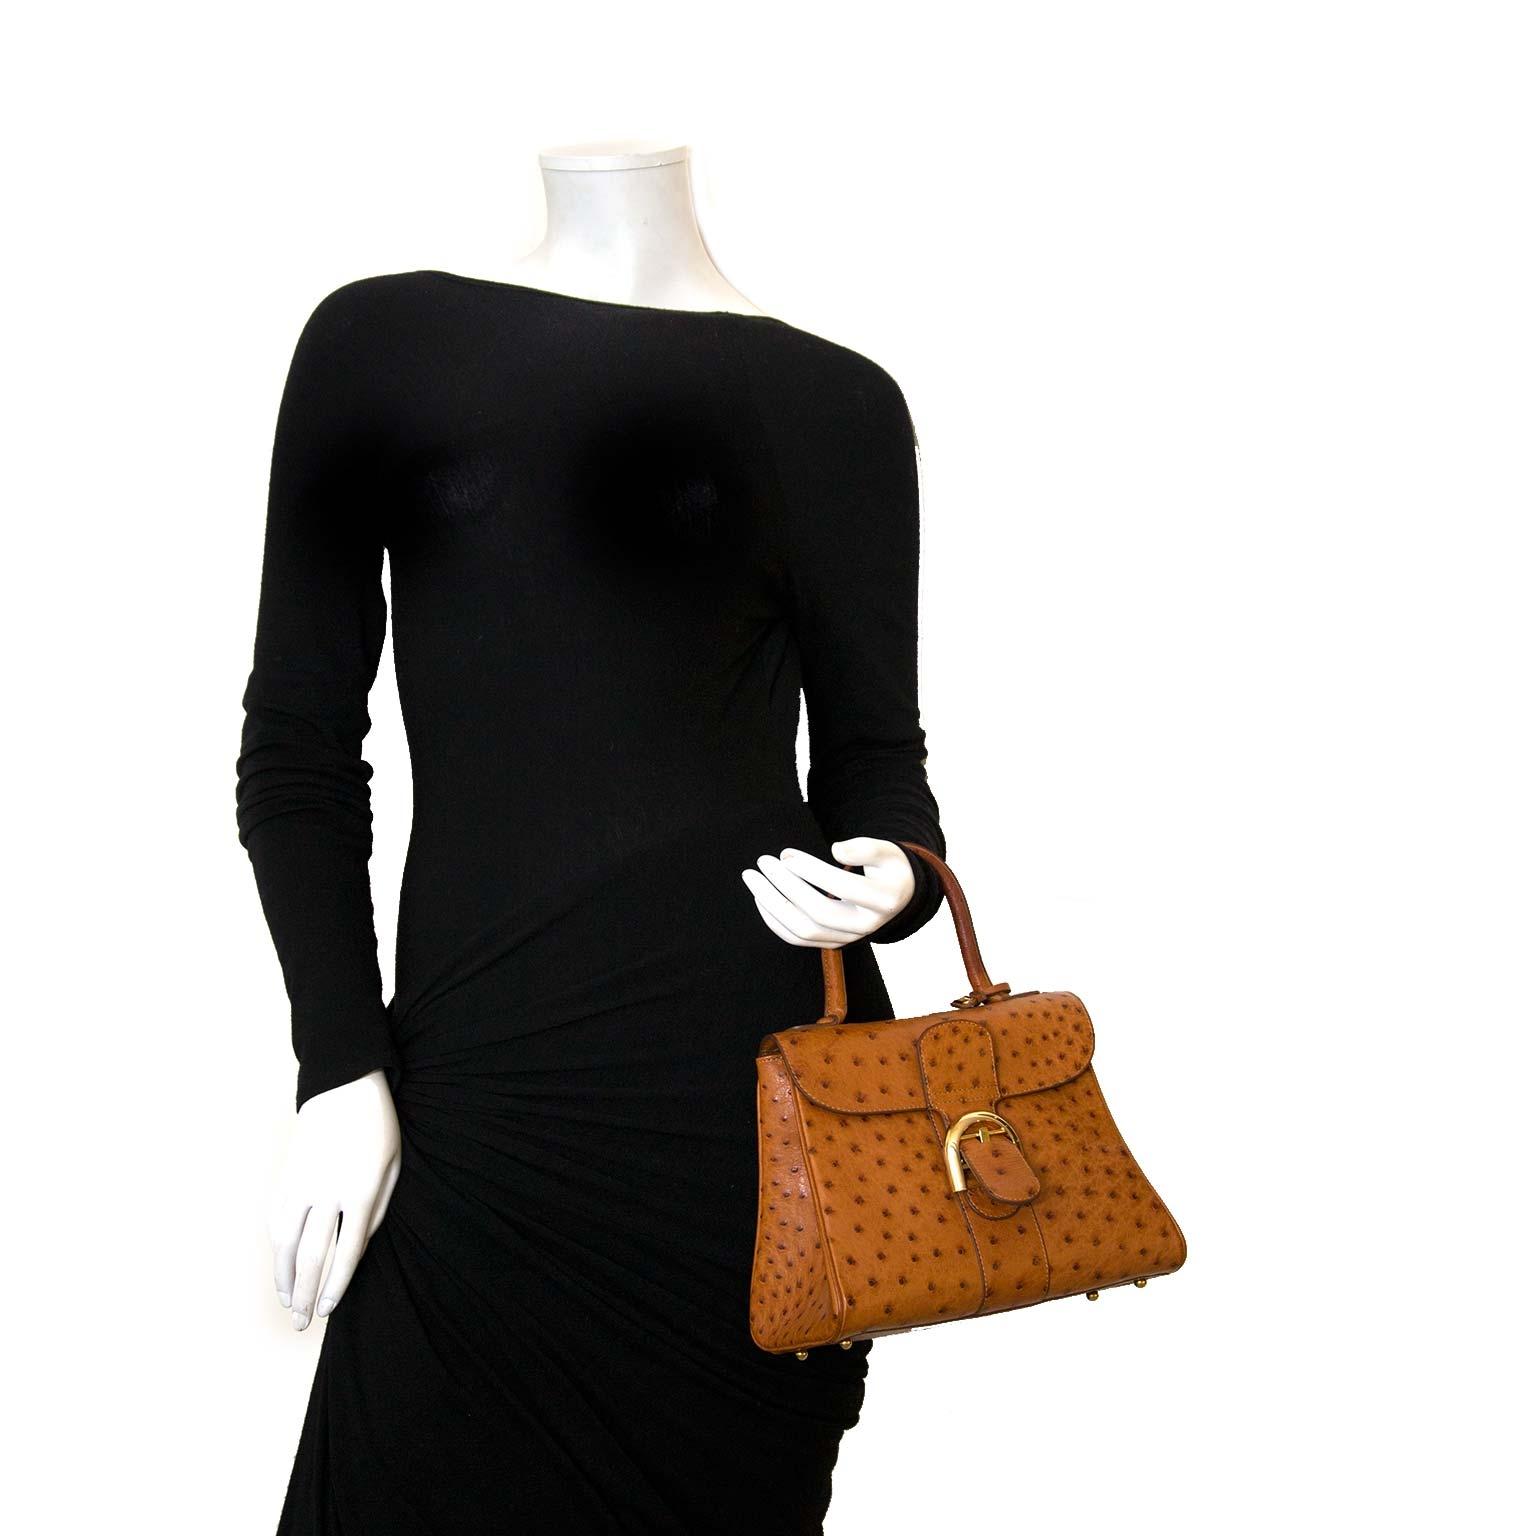 Koop authentieke Delvaux brillant tassen nu online bij Labellov vintage webshop